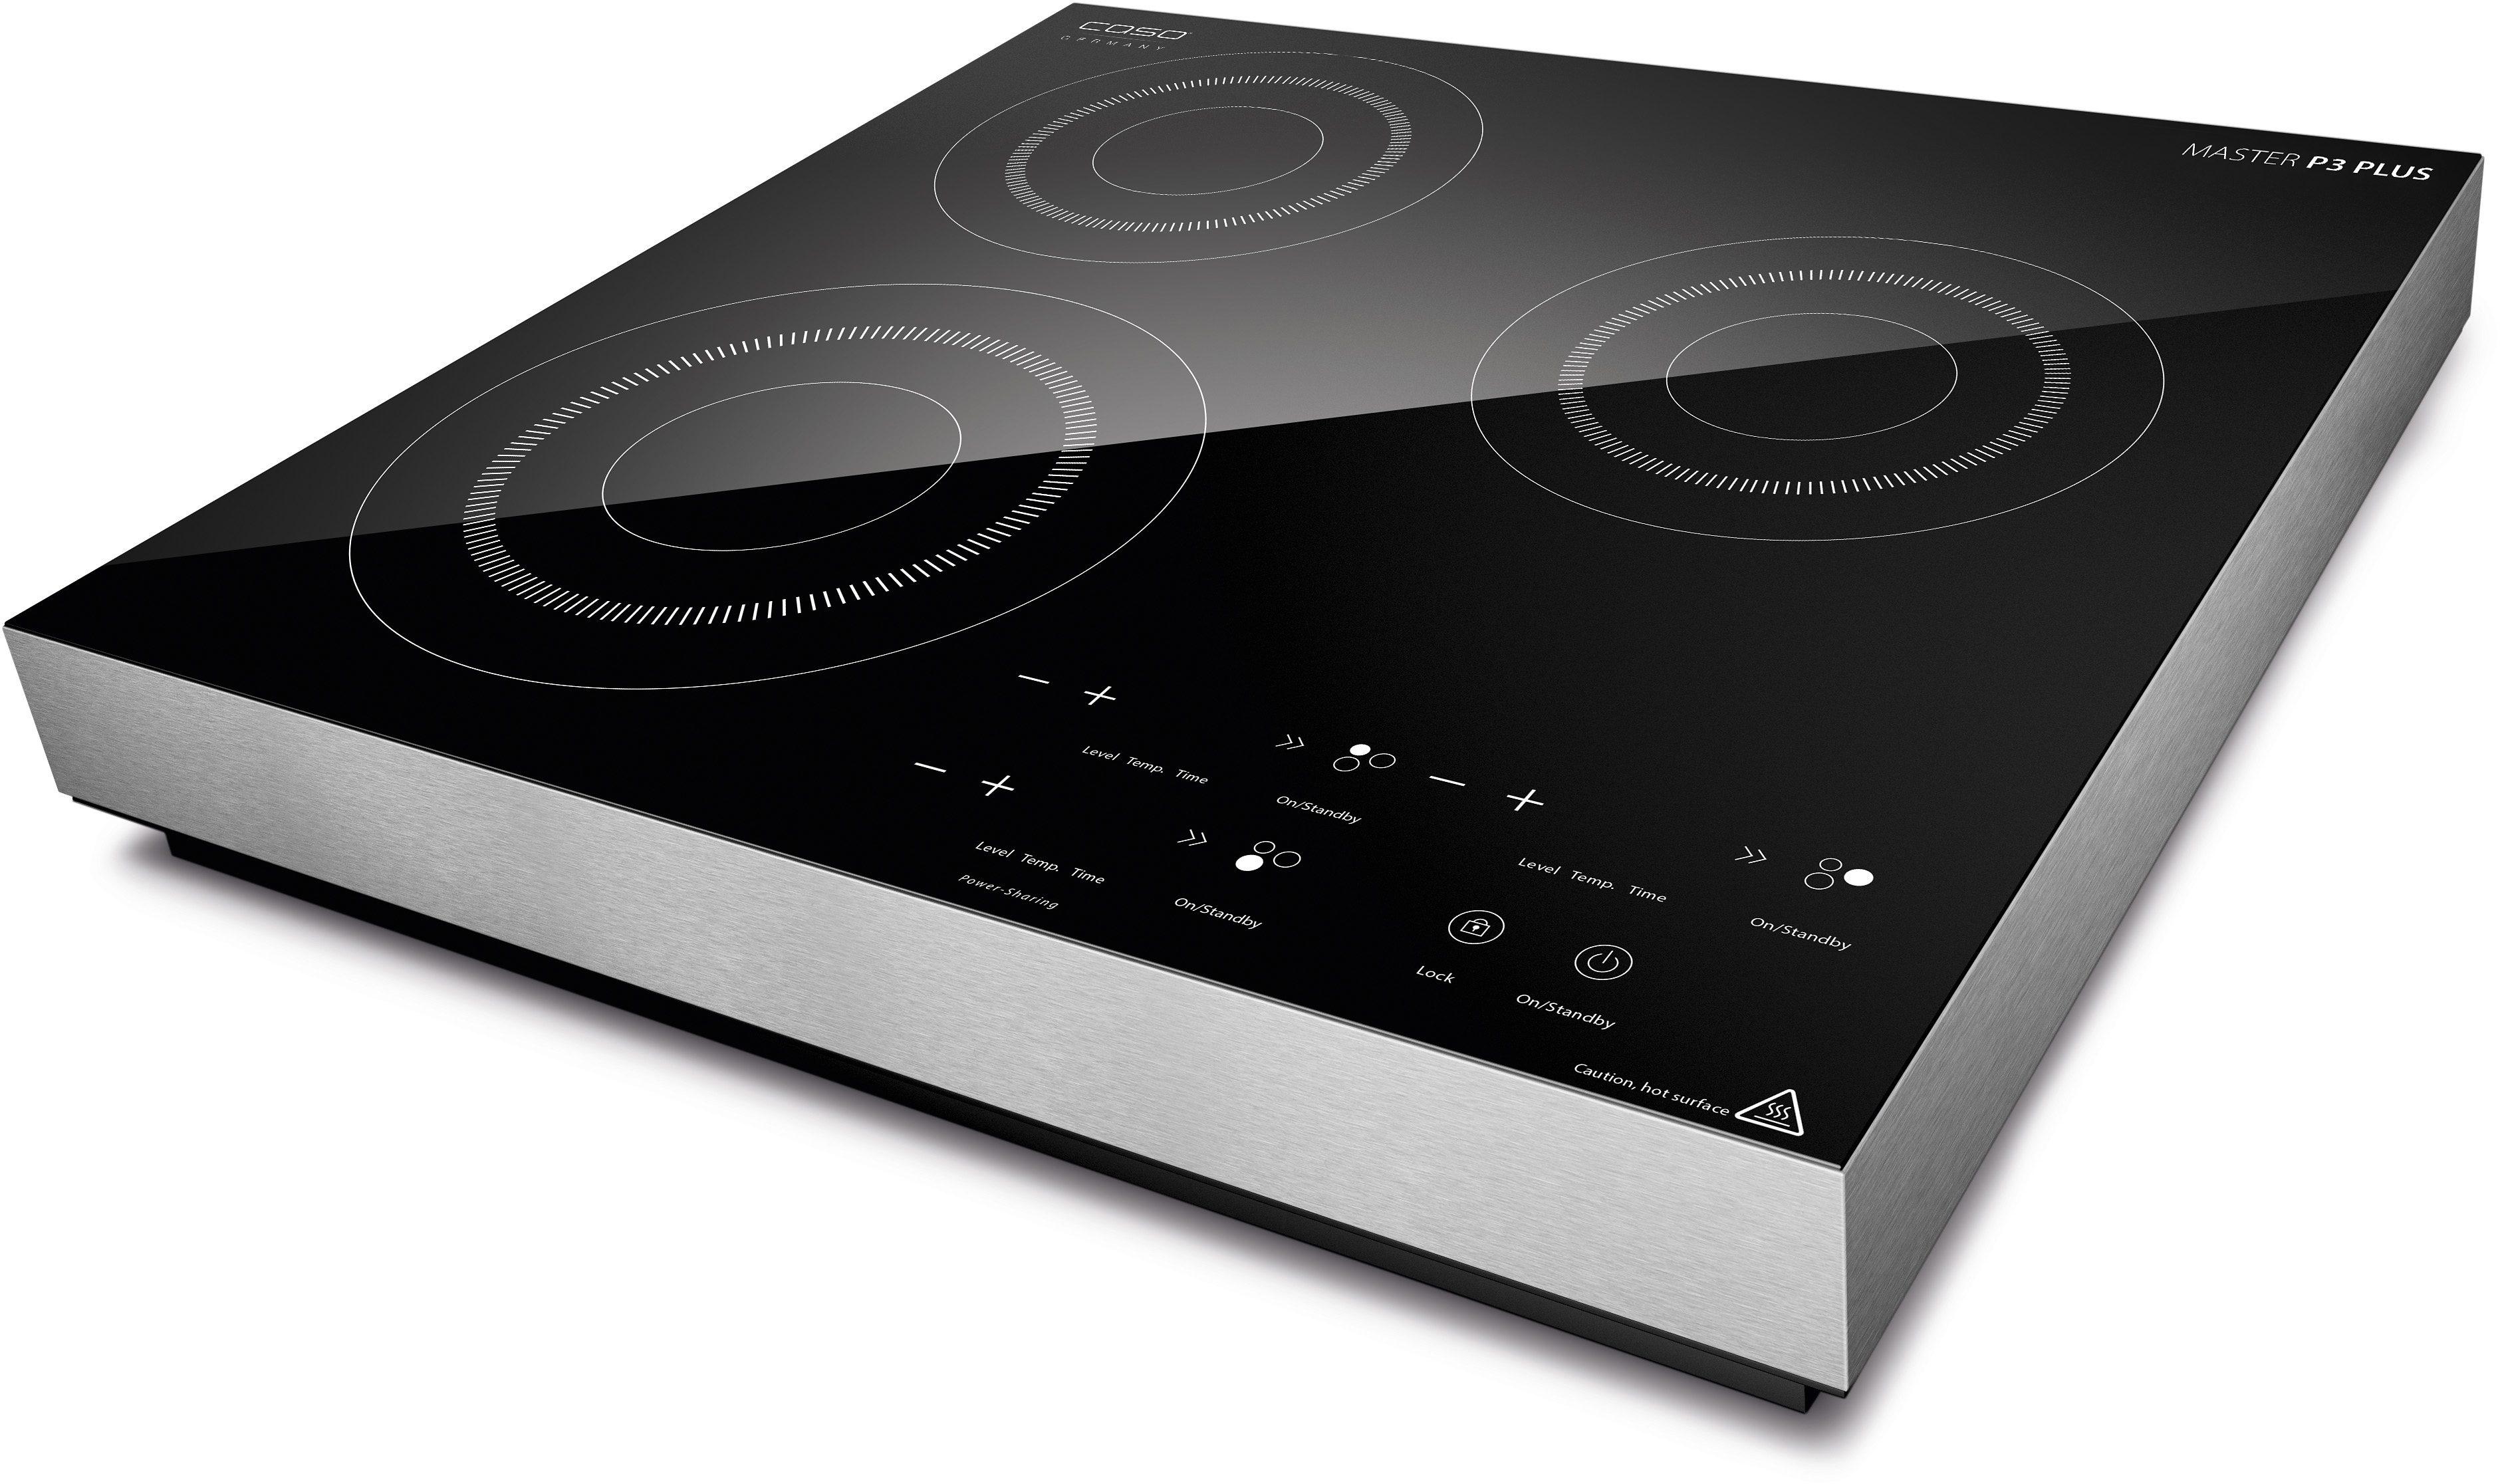 CASO Mobiles Design Induktionskochfeld CASO Master P3 Plus, 3500 Watt, mit Timer